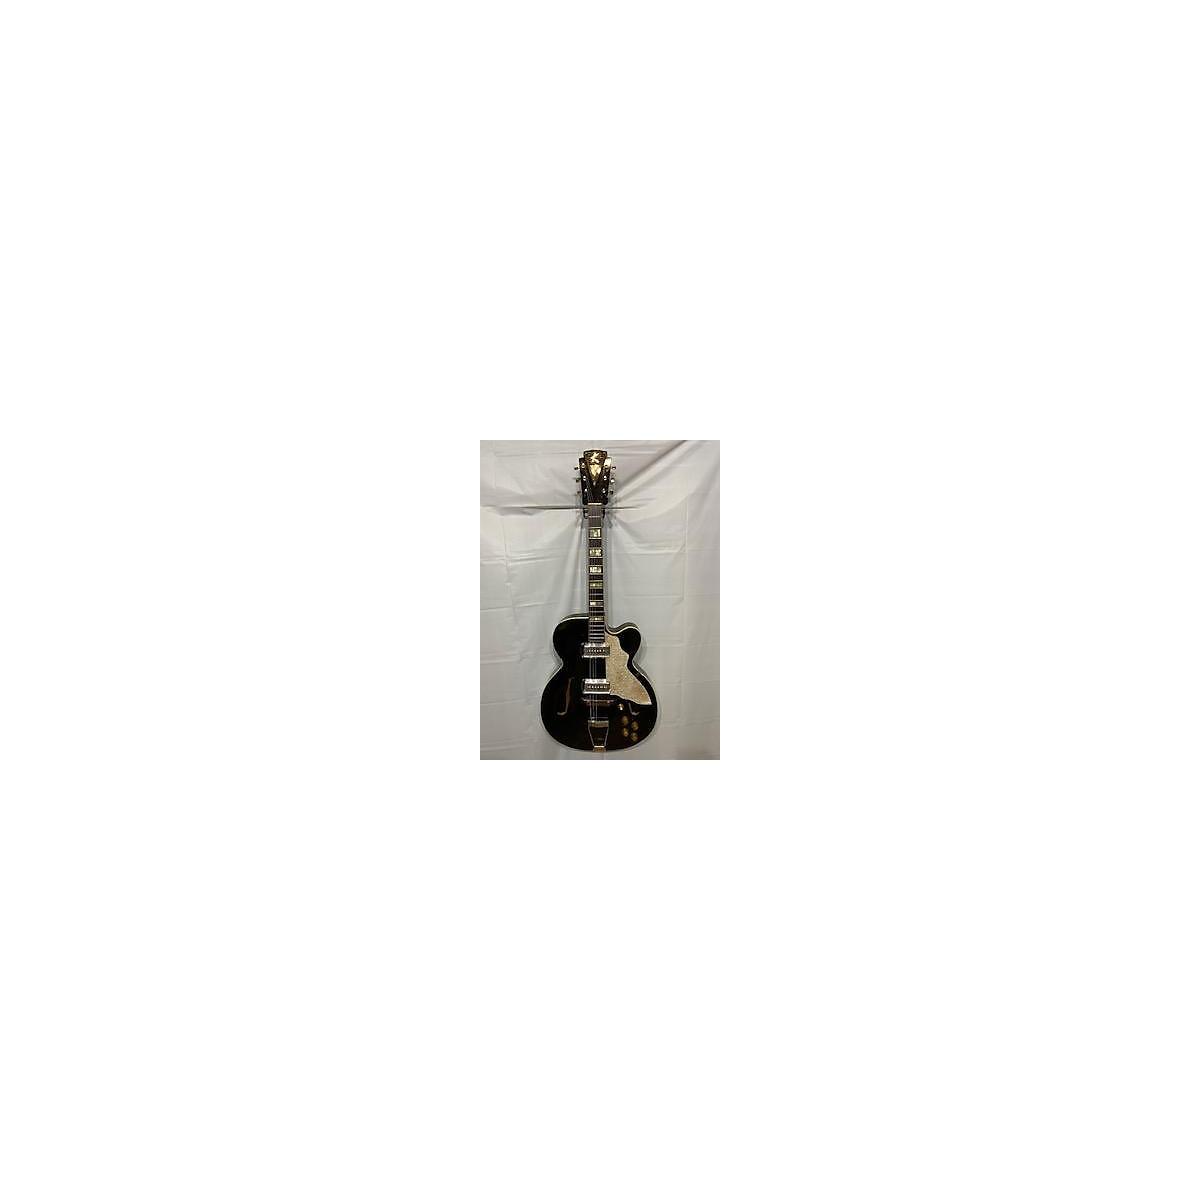 Kay 1950s Kelvinator Upbeat Hollow Body Electric Guitar